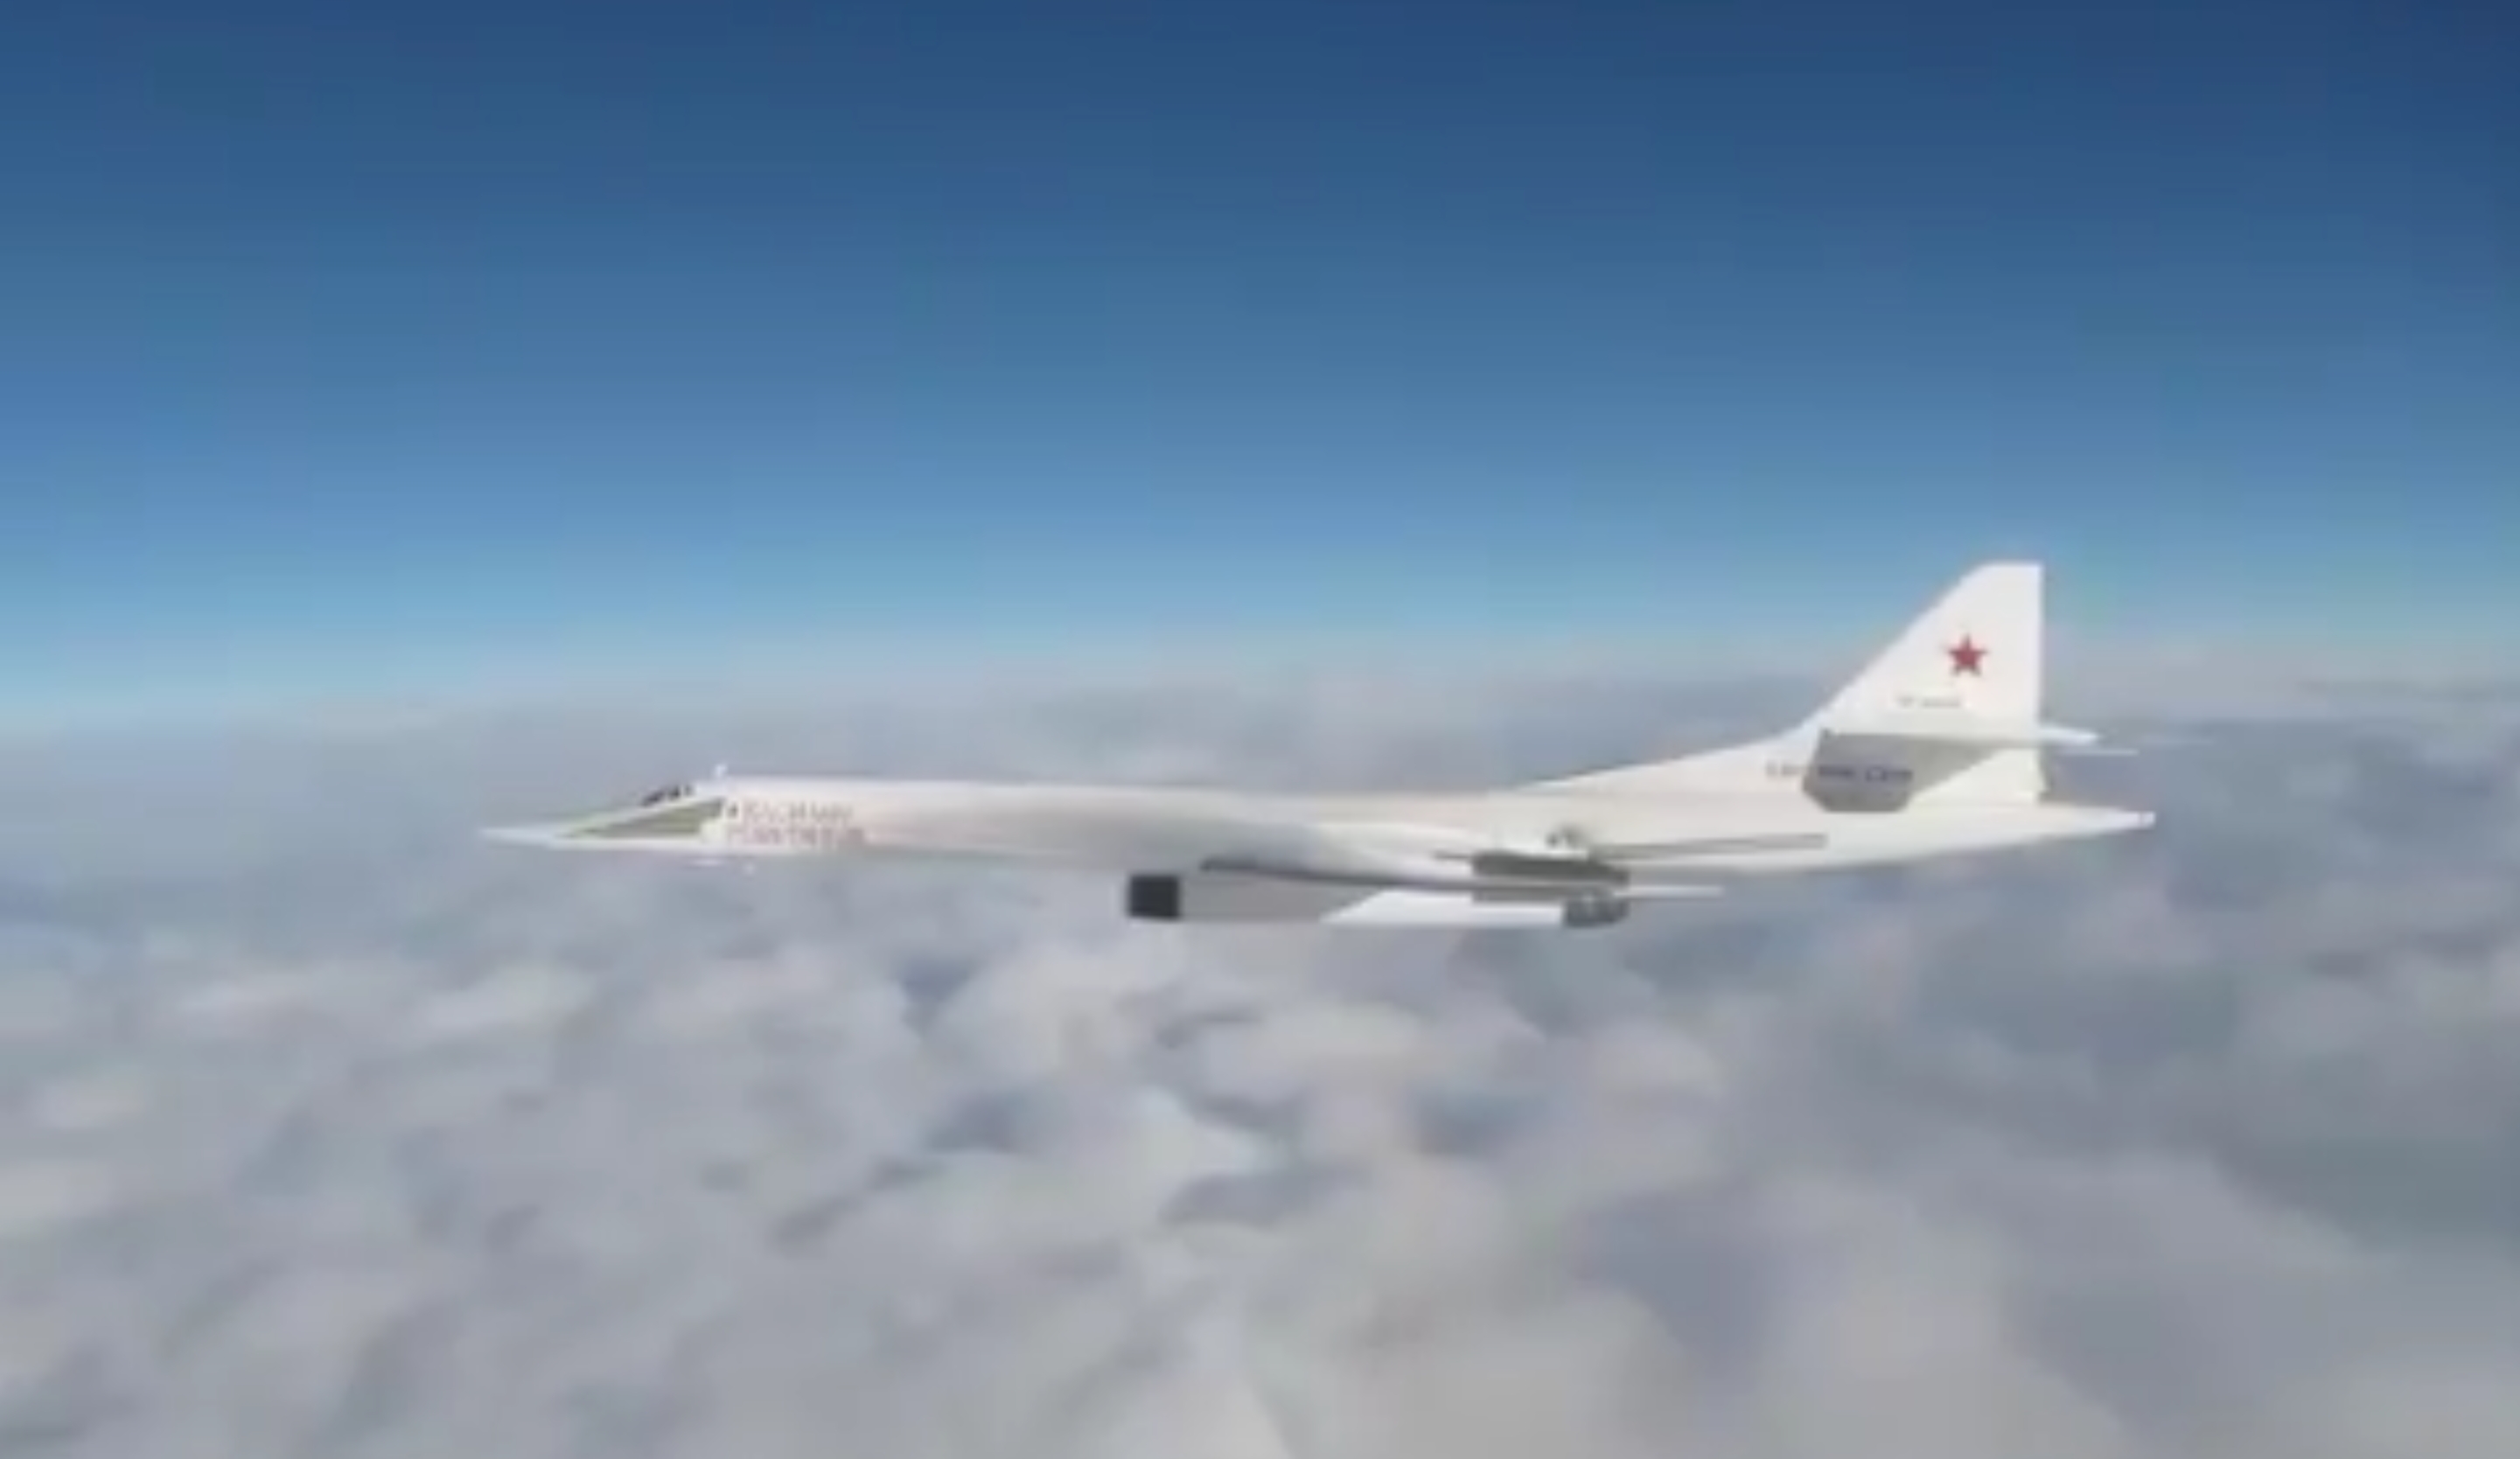 Russian Tu-160s